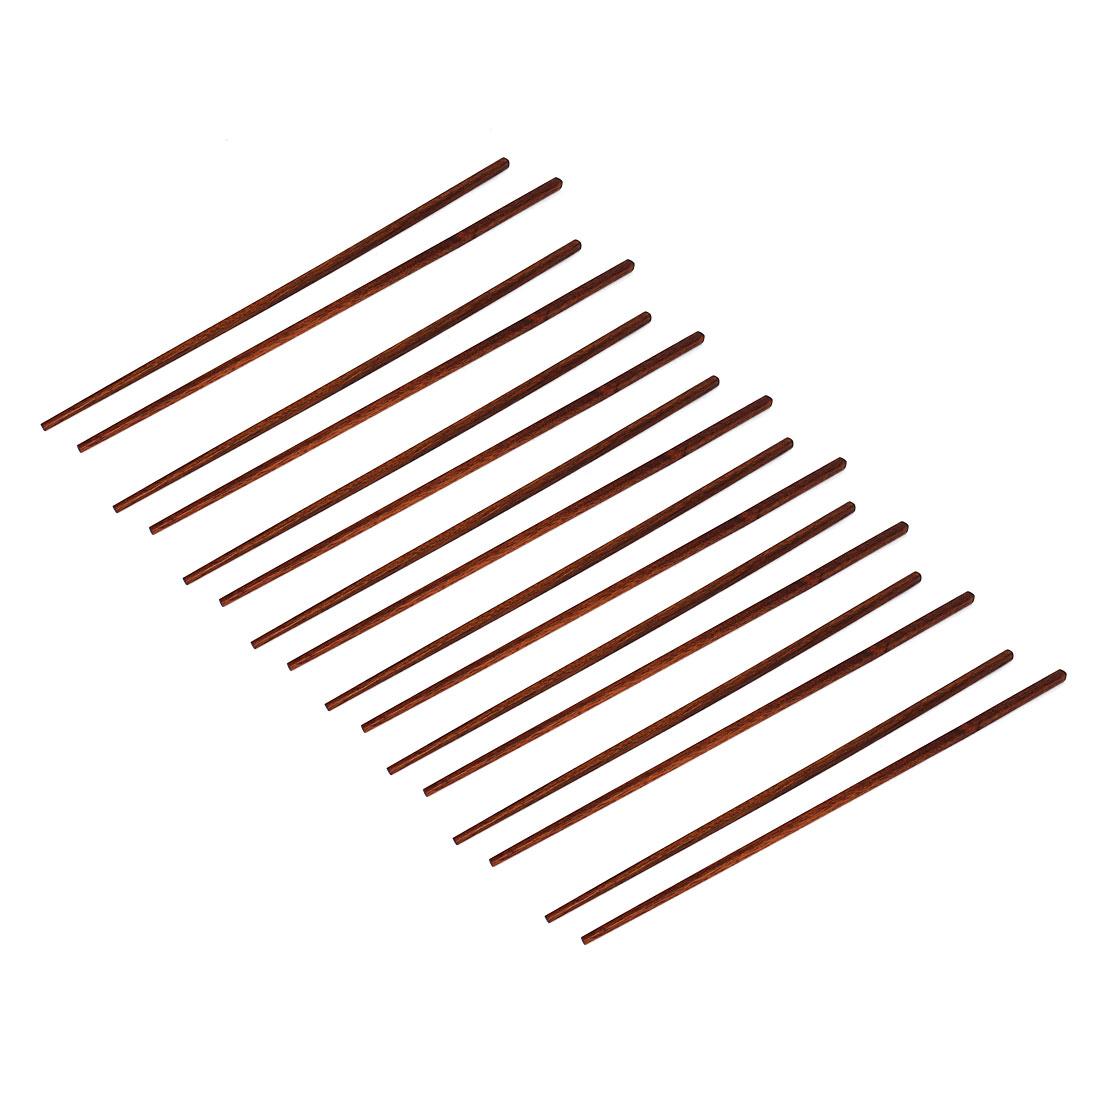 8 Pairs Wooden Chopsticks Kitchen Hot Pot Chop Sticks Coffee Color